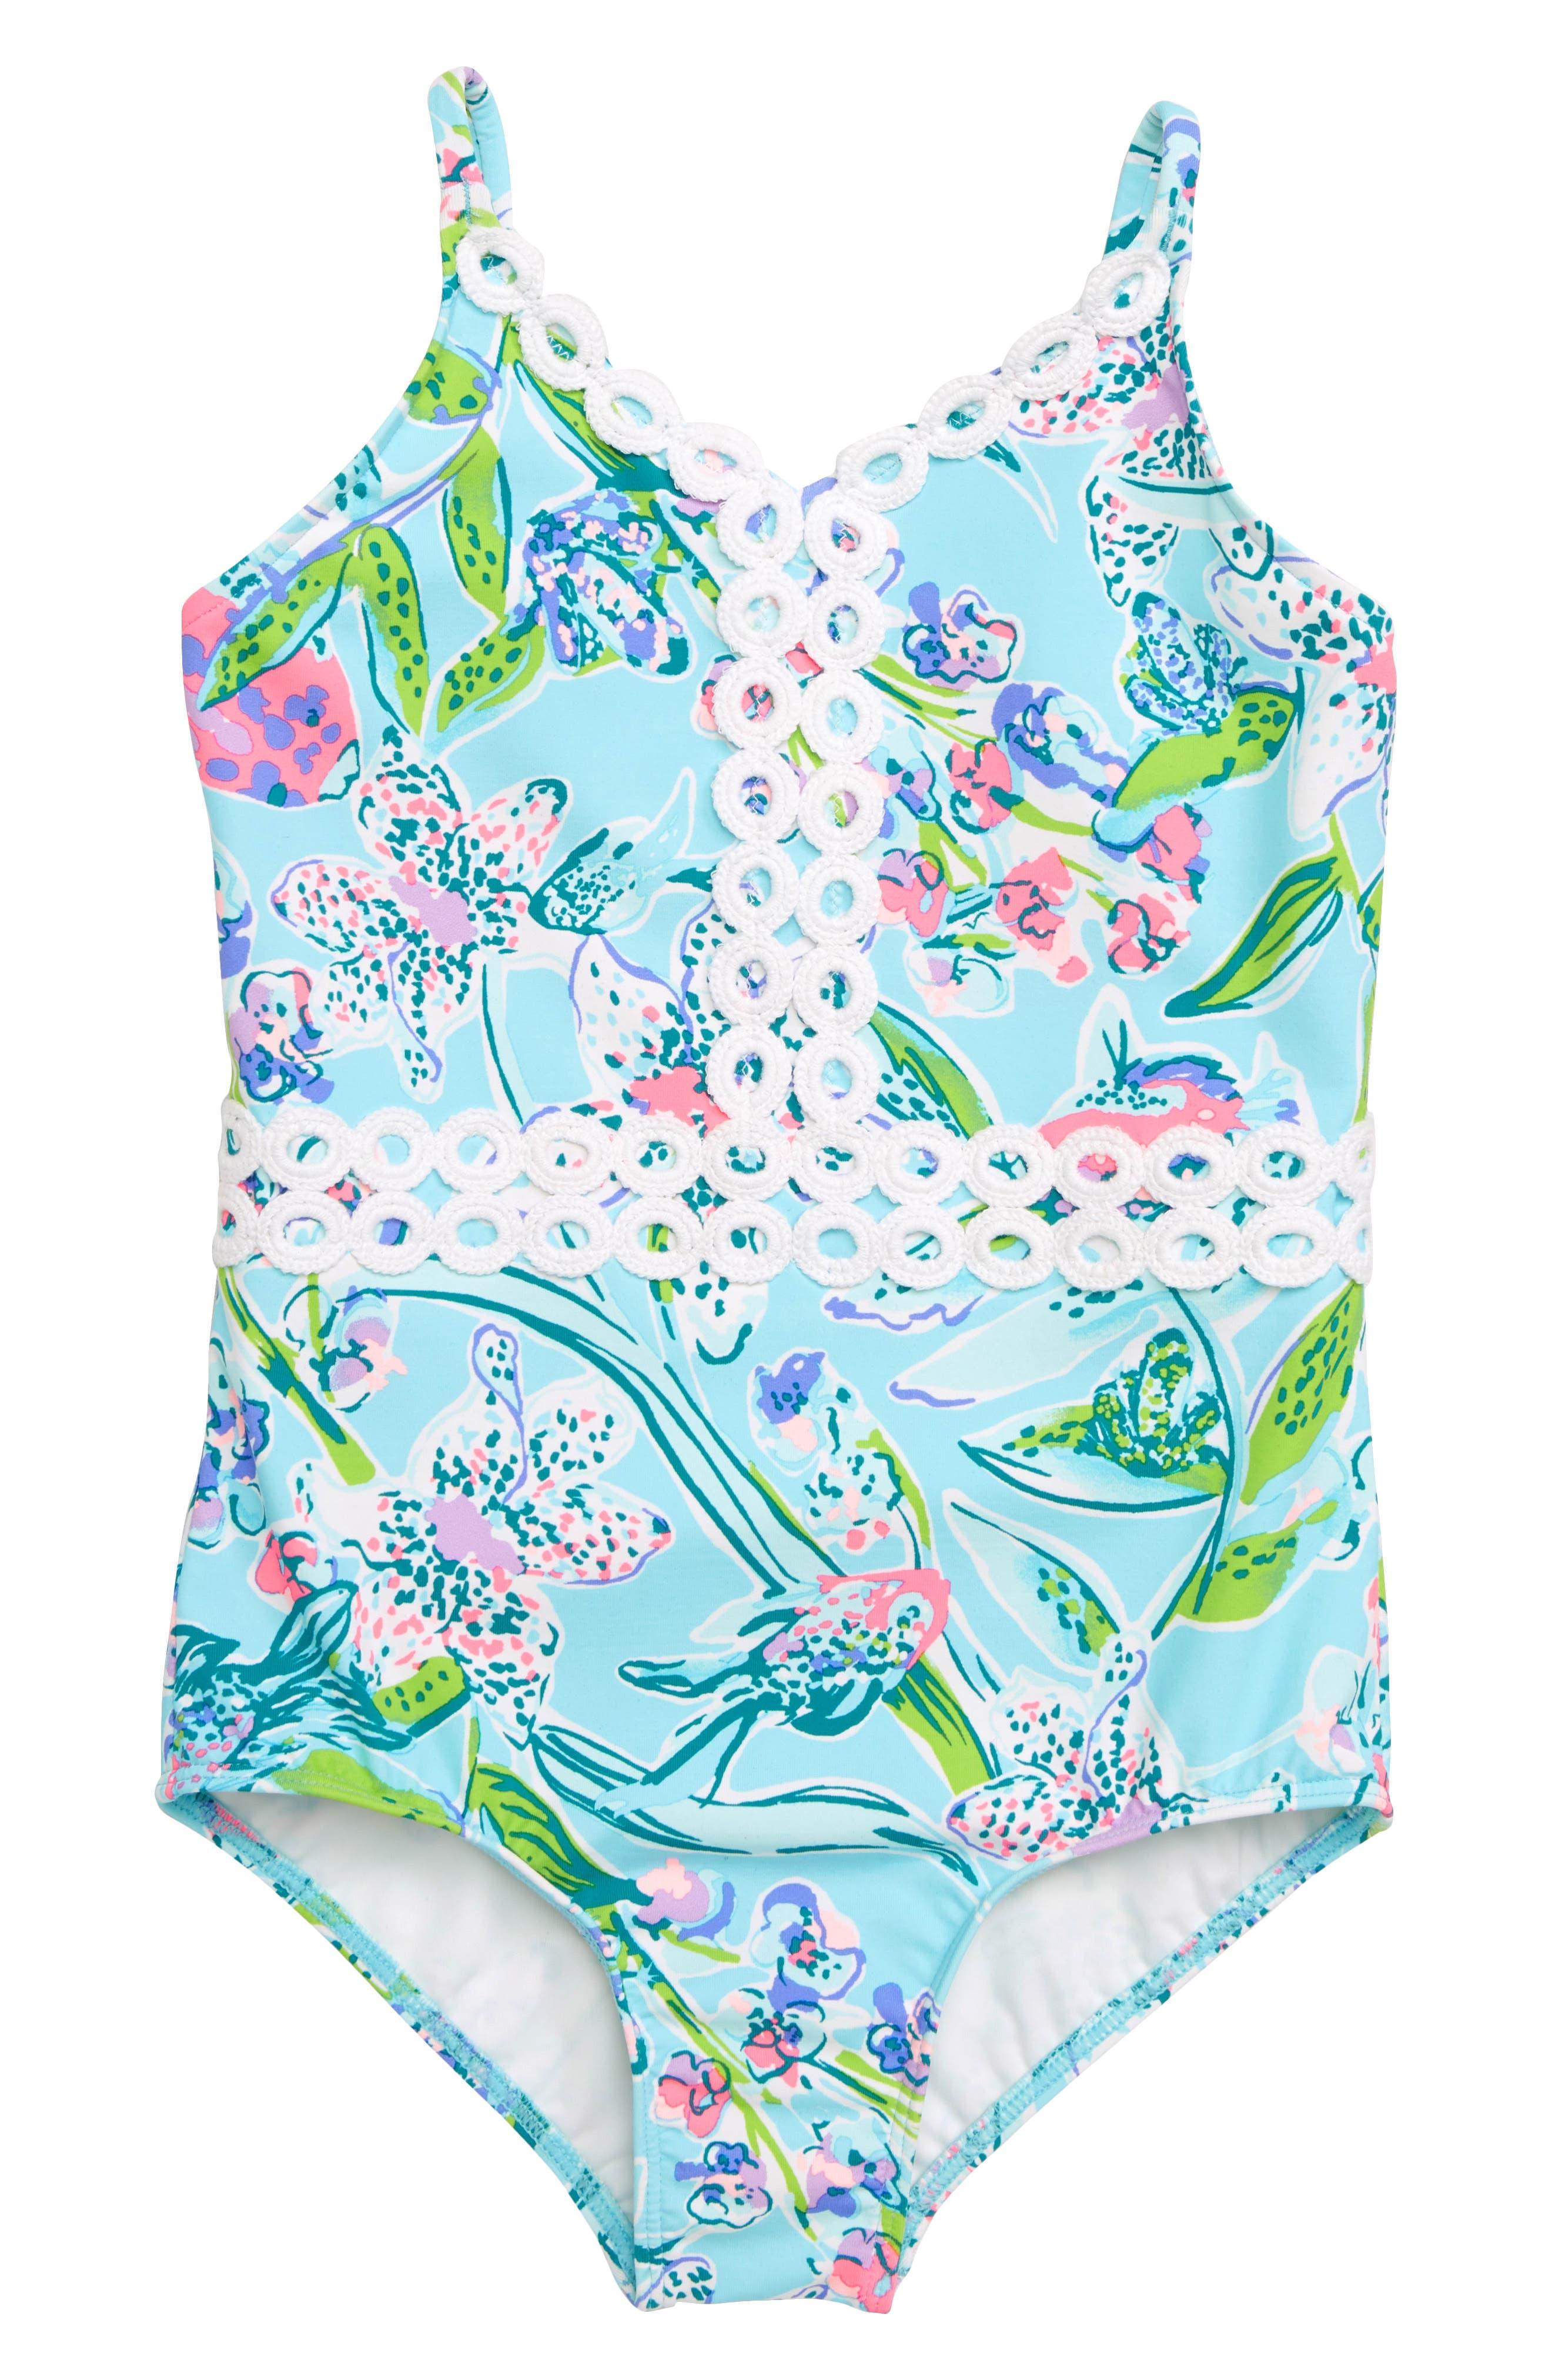 cef29a05f3 Lilly Pulitzer® Women s   Girls  Swimwear Fashion